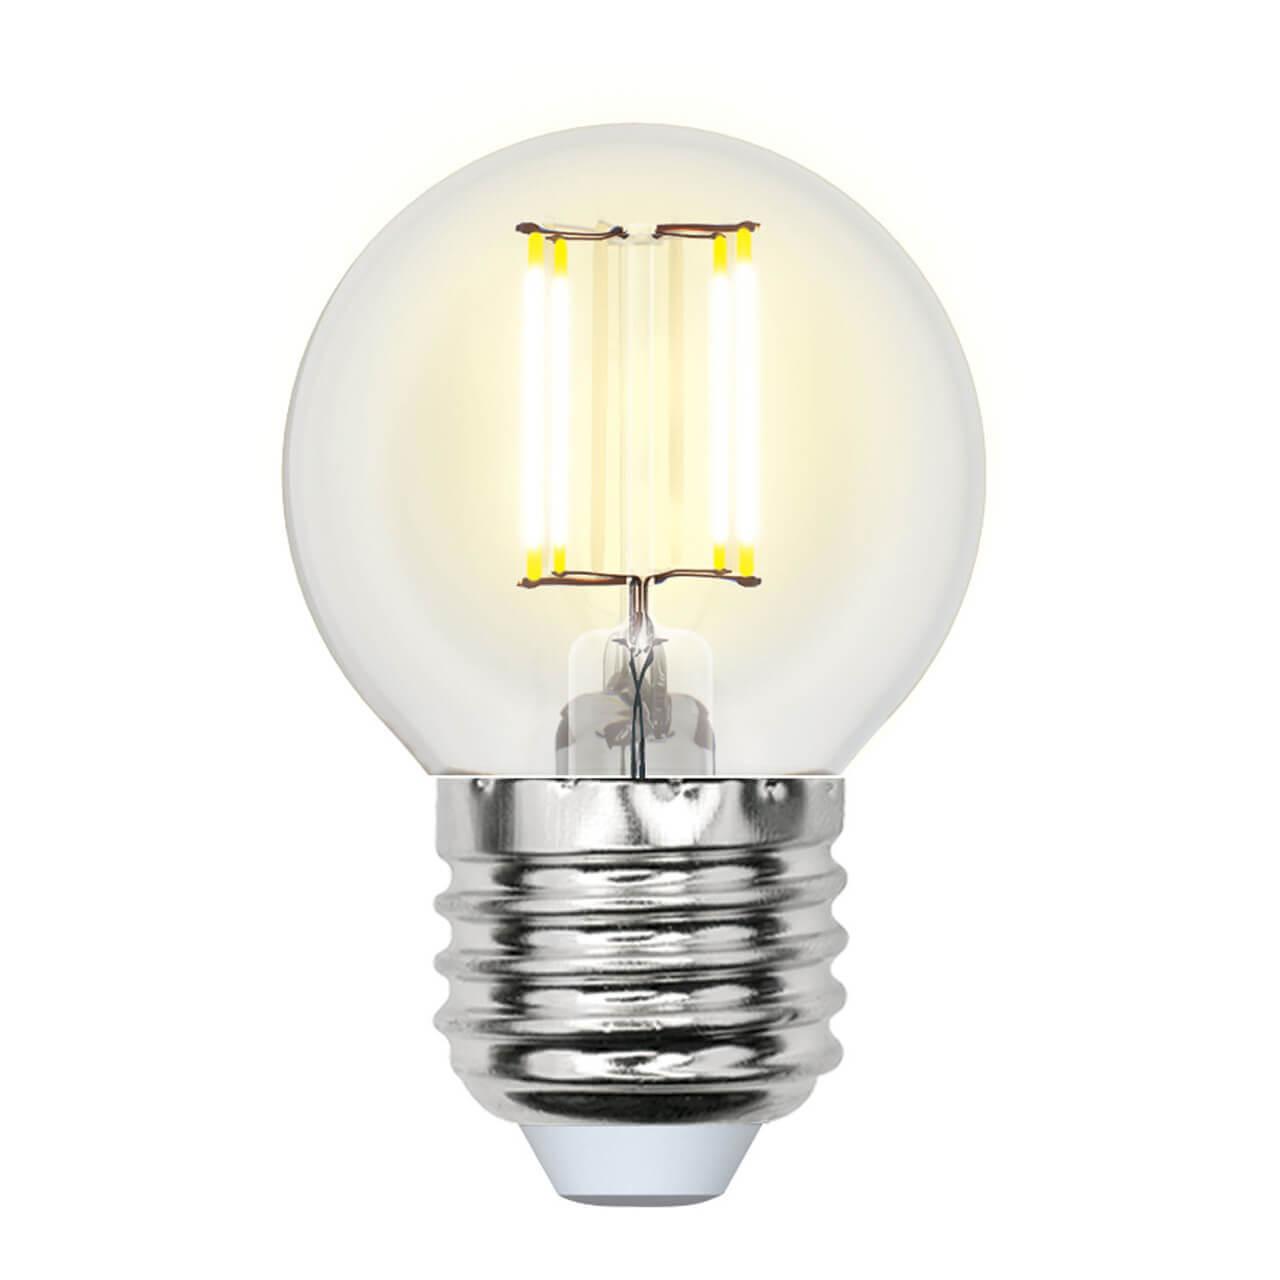 Лампа светодиодная филаментная (UL-00002203) Uniel E27 6W 3000K прозрачная LED-G45-6W/WW/E27/CL GLA01TR цена